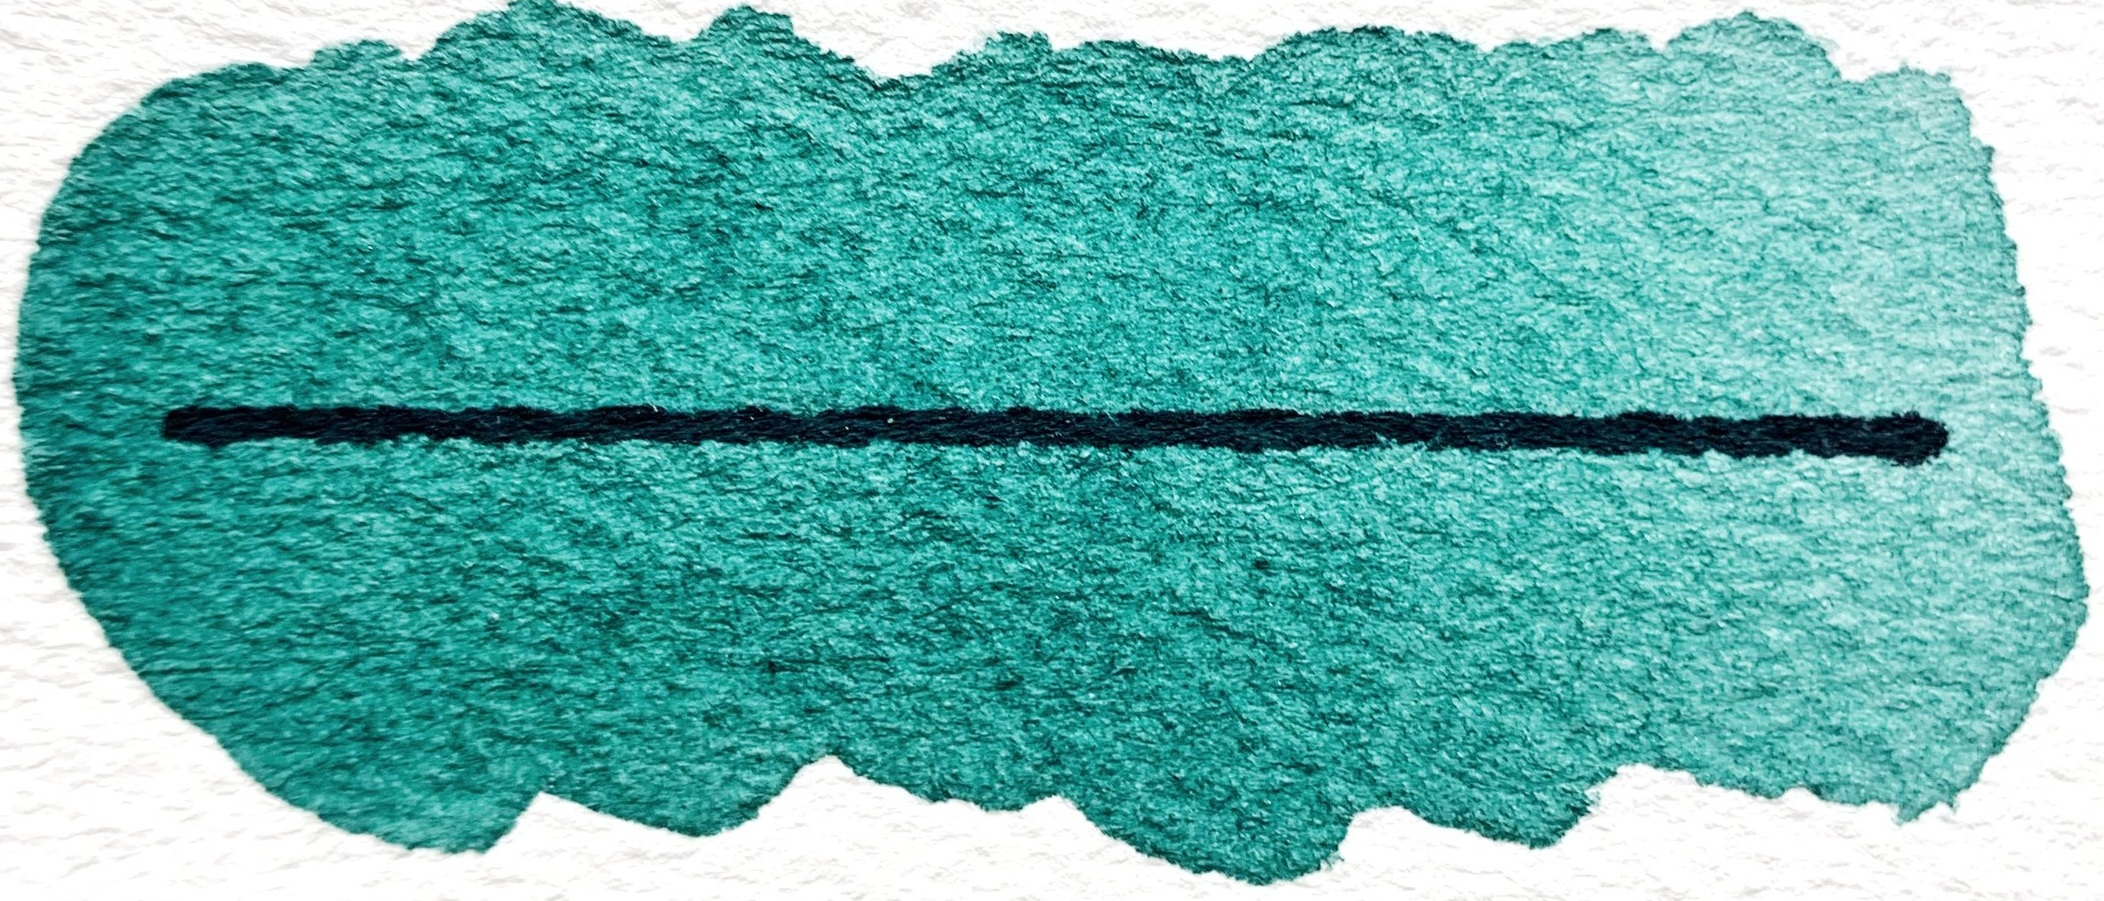 Mayan Green Original Discontinued - Transparent, good lightfastness, mildly staining